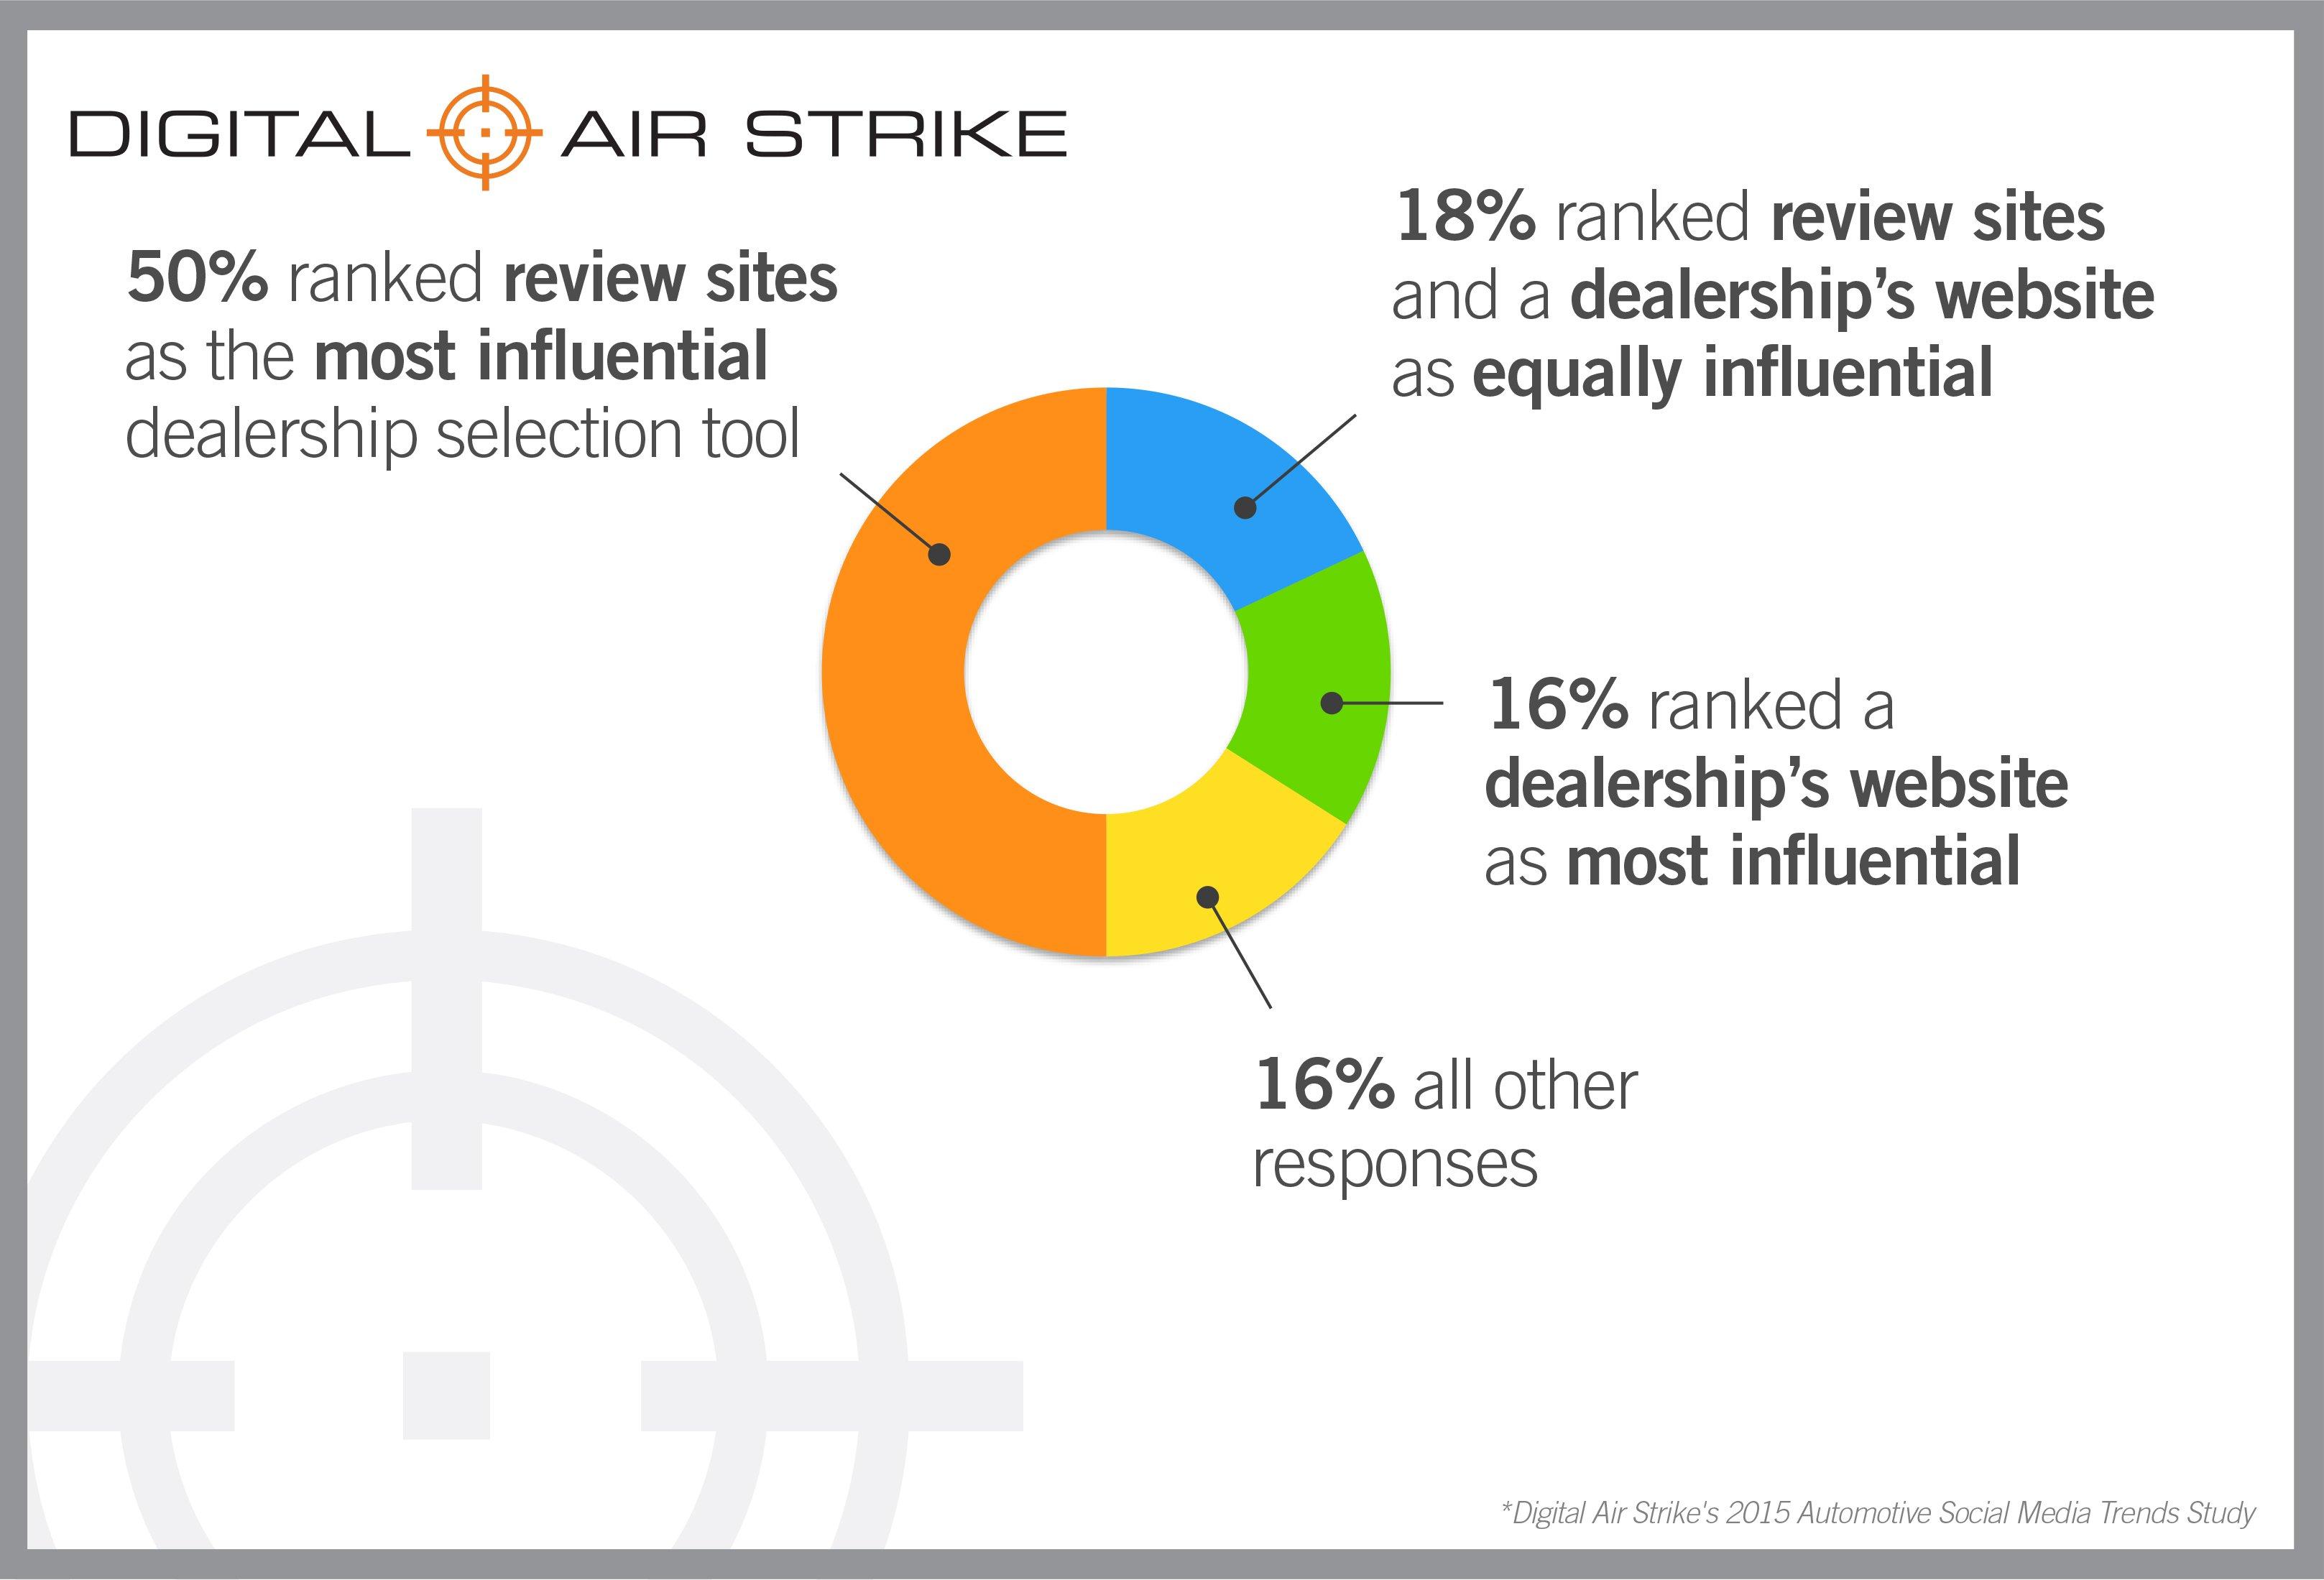 2015 Automotive Social Media Trends Study Digital Air Strike